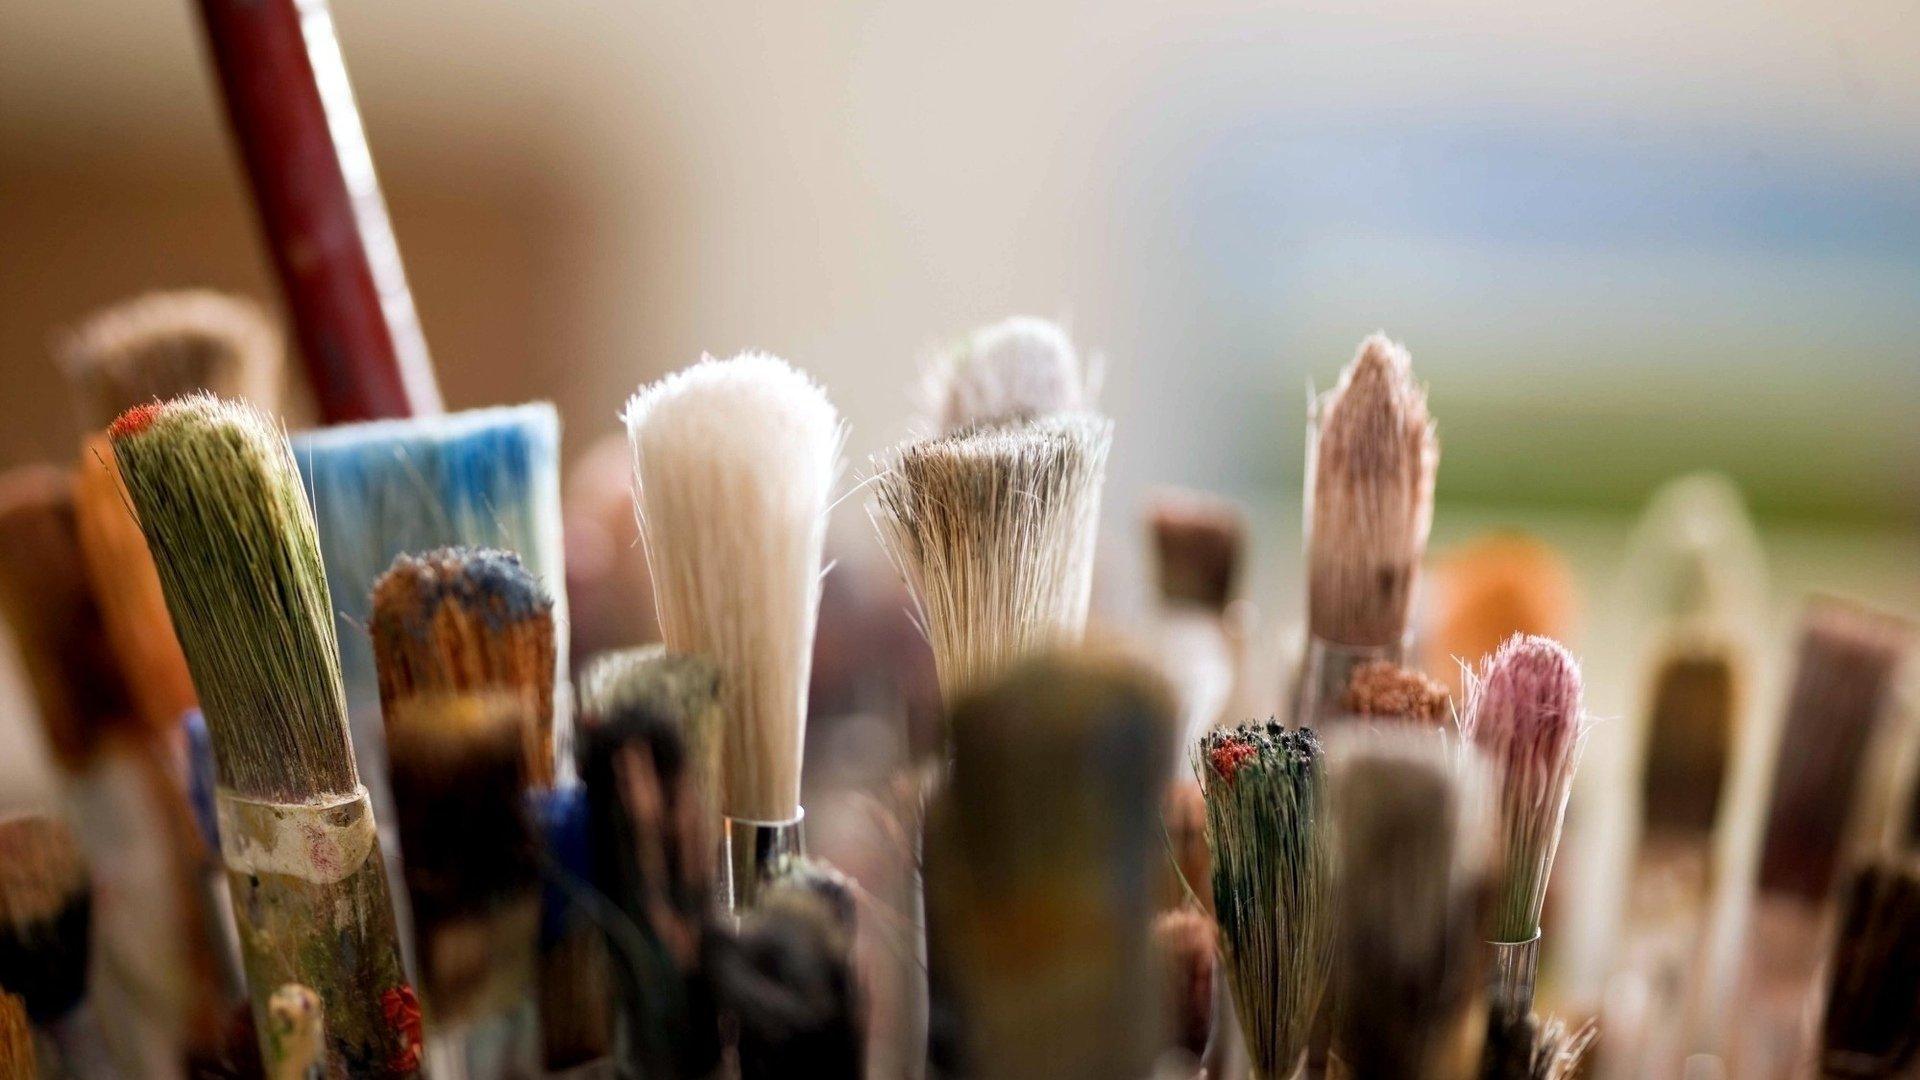 Brush wallpaper photo full hd